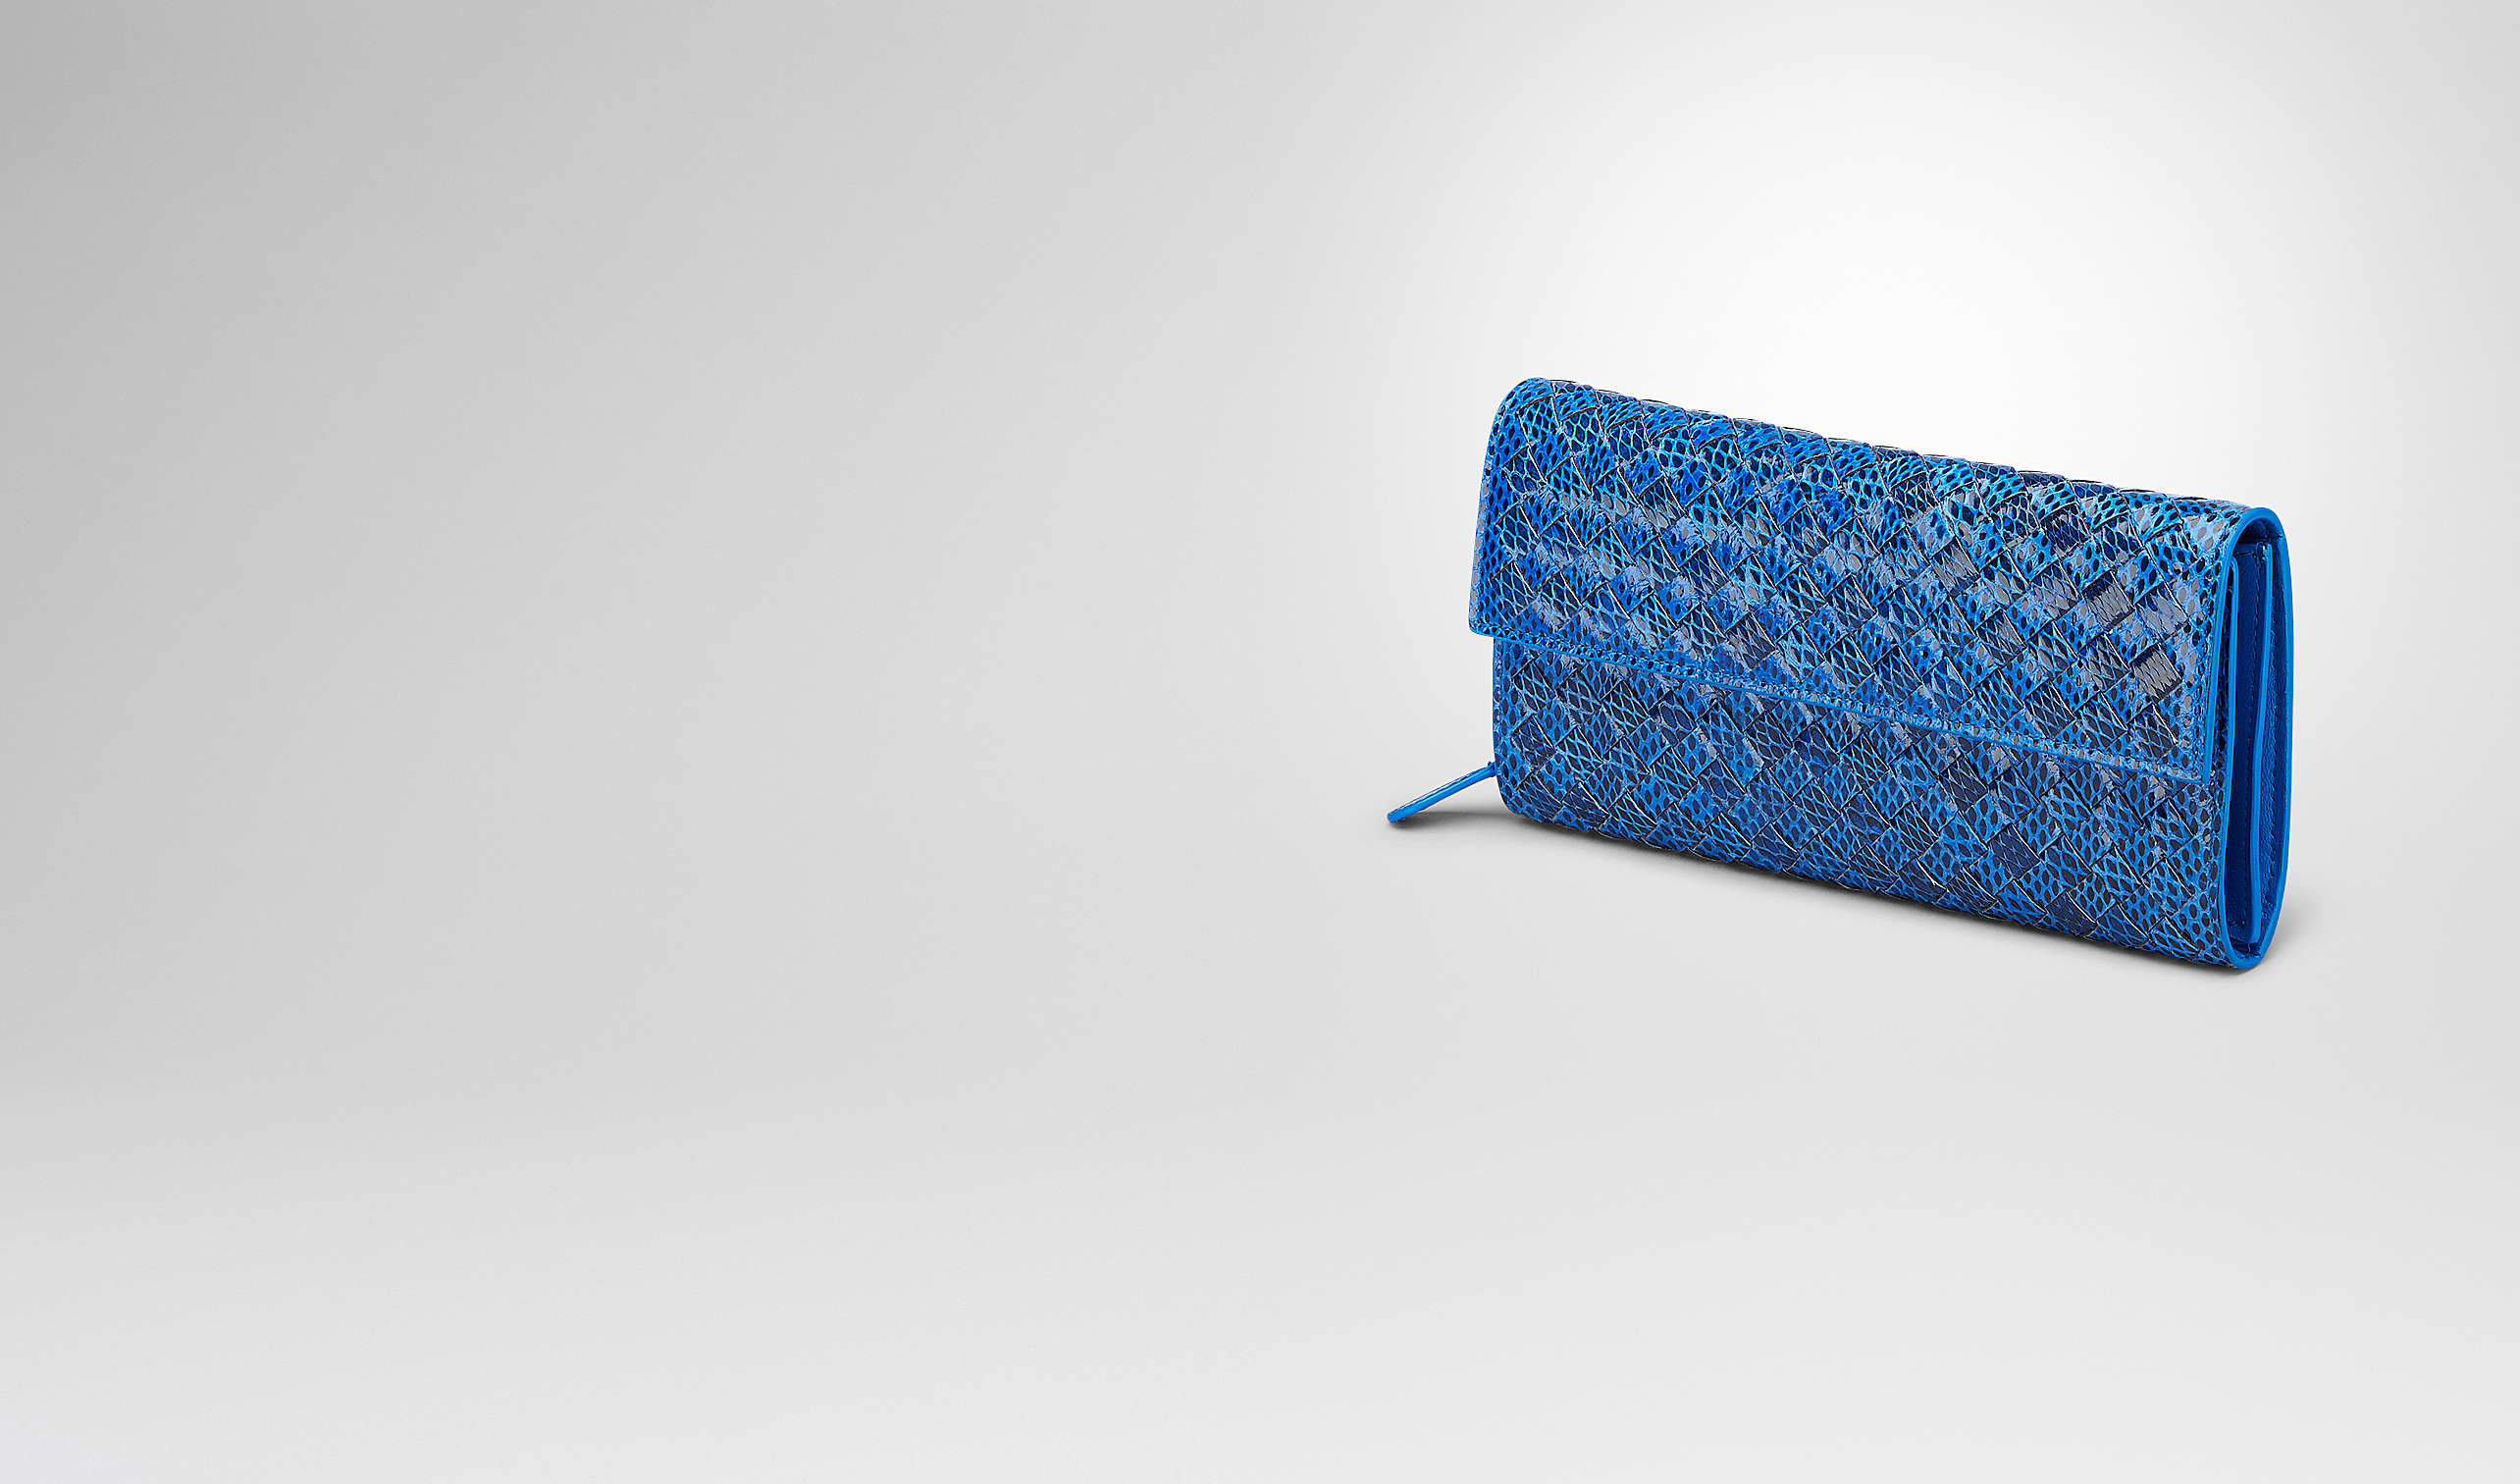 BOTTEGA VENETA Continental Portemonnaie D CONTINENTAL PORTEMONNAIE aus Ayers Livrea Intrecciato SIGNAL BLUE pl